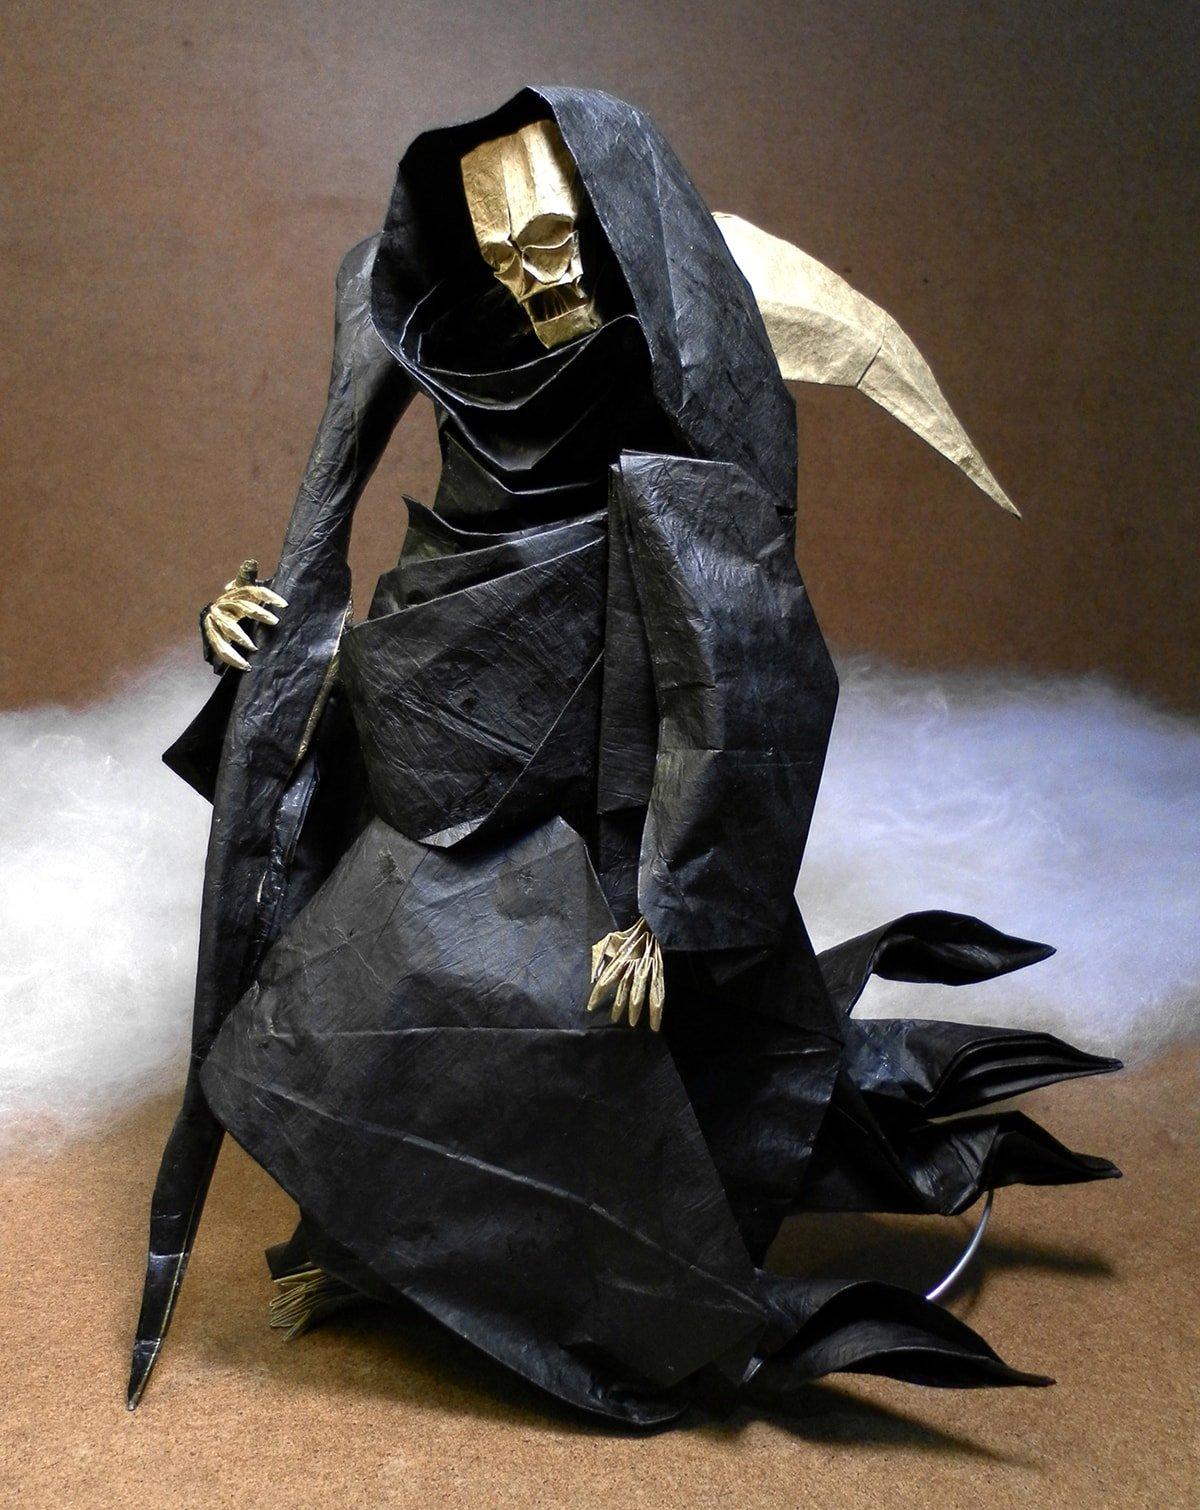 Origami Grim Reaper by Mariano Zavala B.